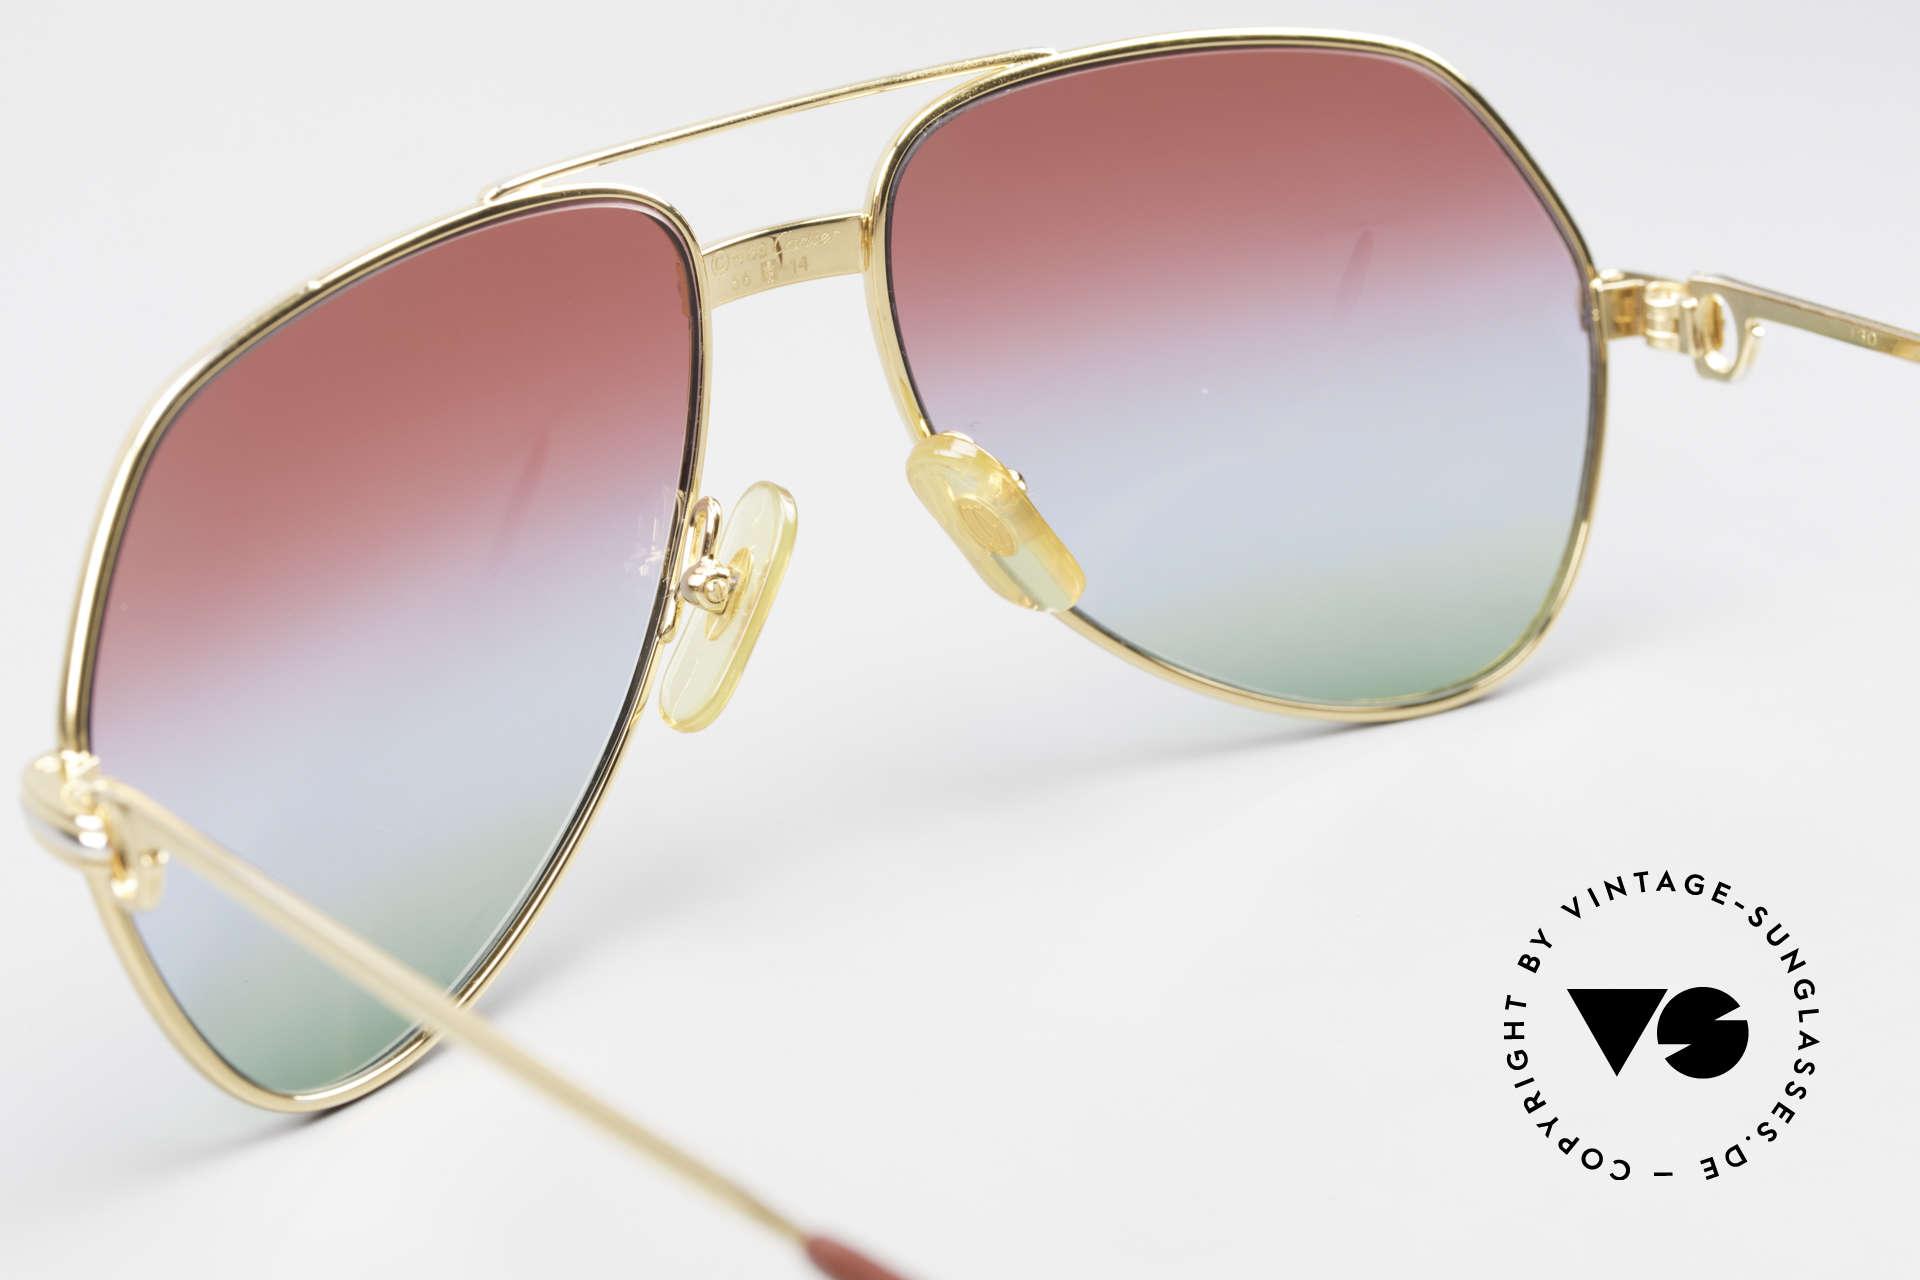 Cartier Vendome LC - S 1980's Sunglasses Tricolored, NO retro sunglasses, but an authentic vintage ORIGINAL, Made for Men and Women